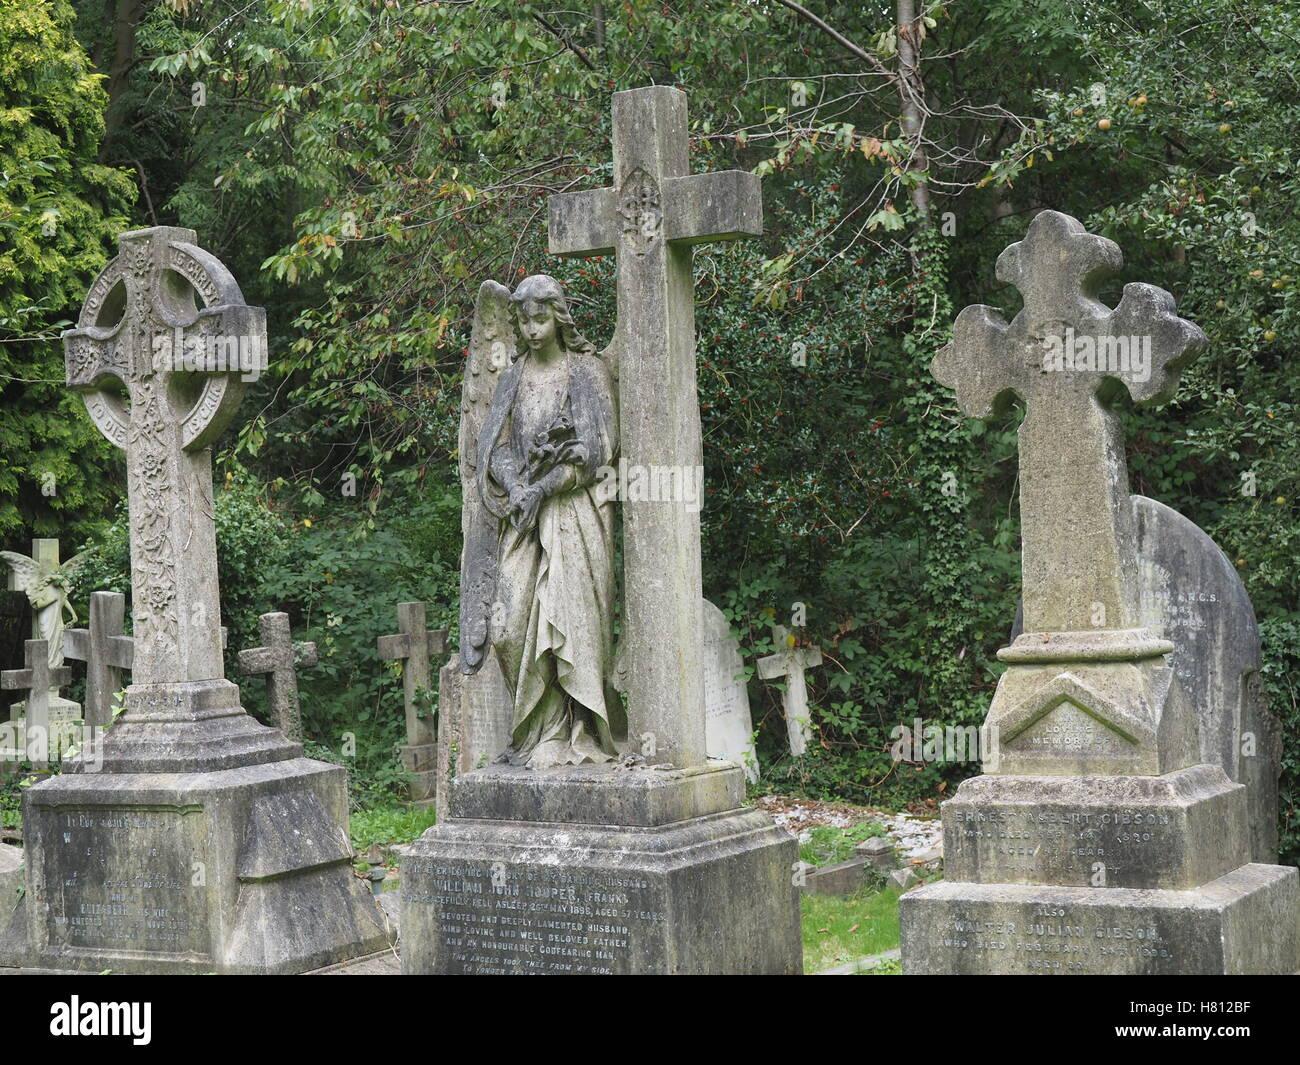 Highgate Cemetery, London - Stock Image